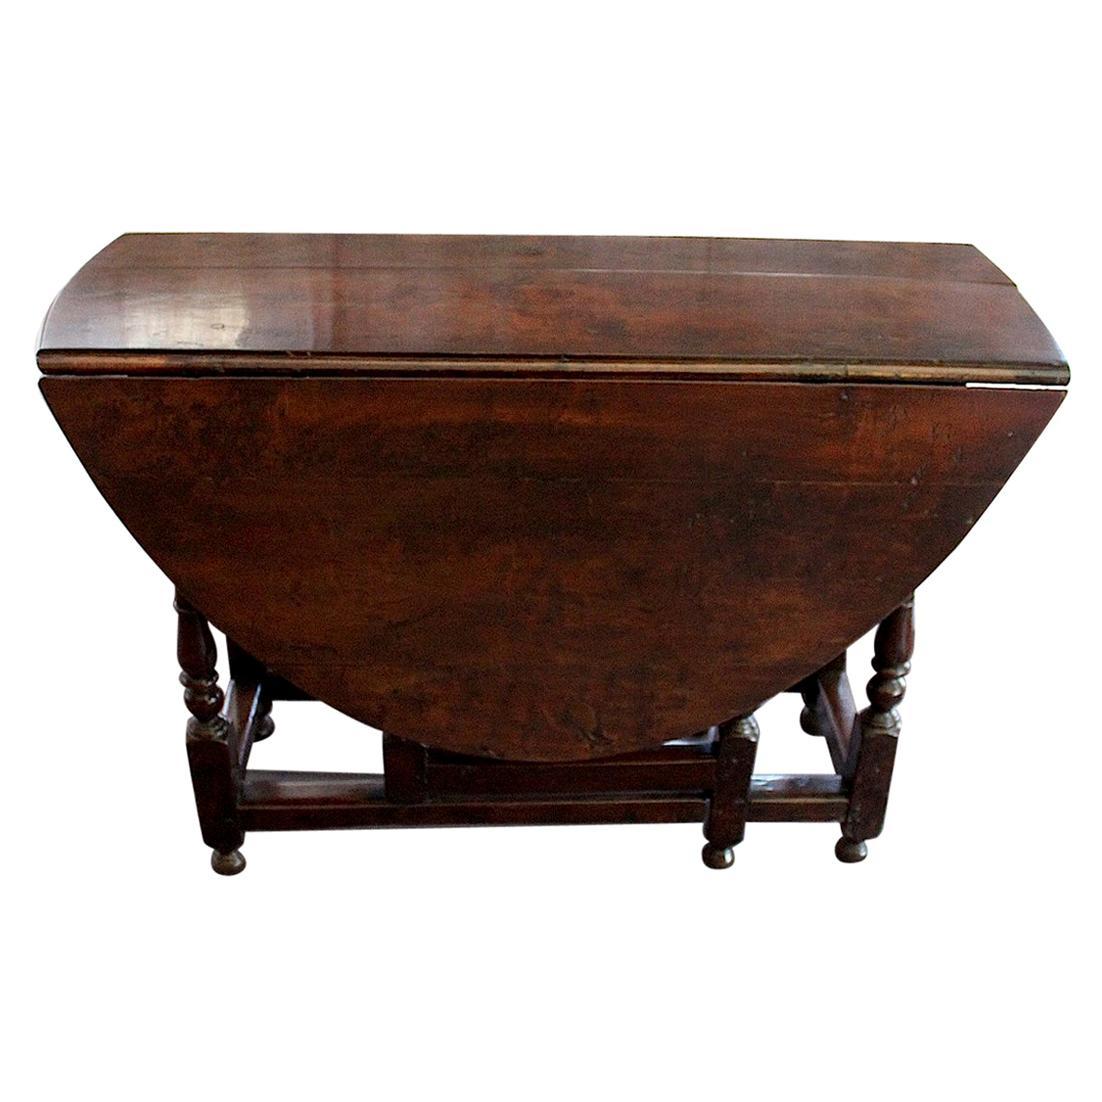 English Walnut Gate Leg Table, circa 1685